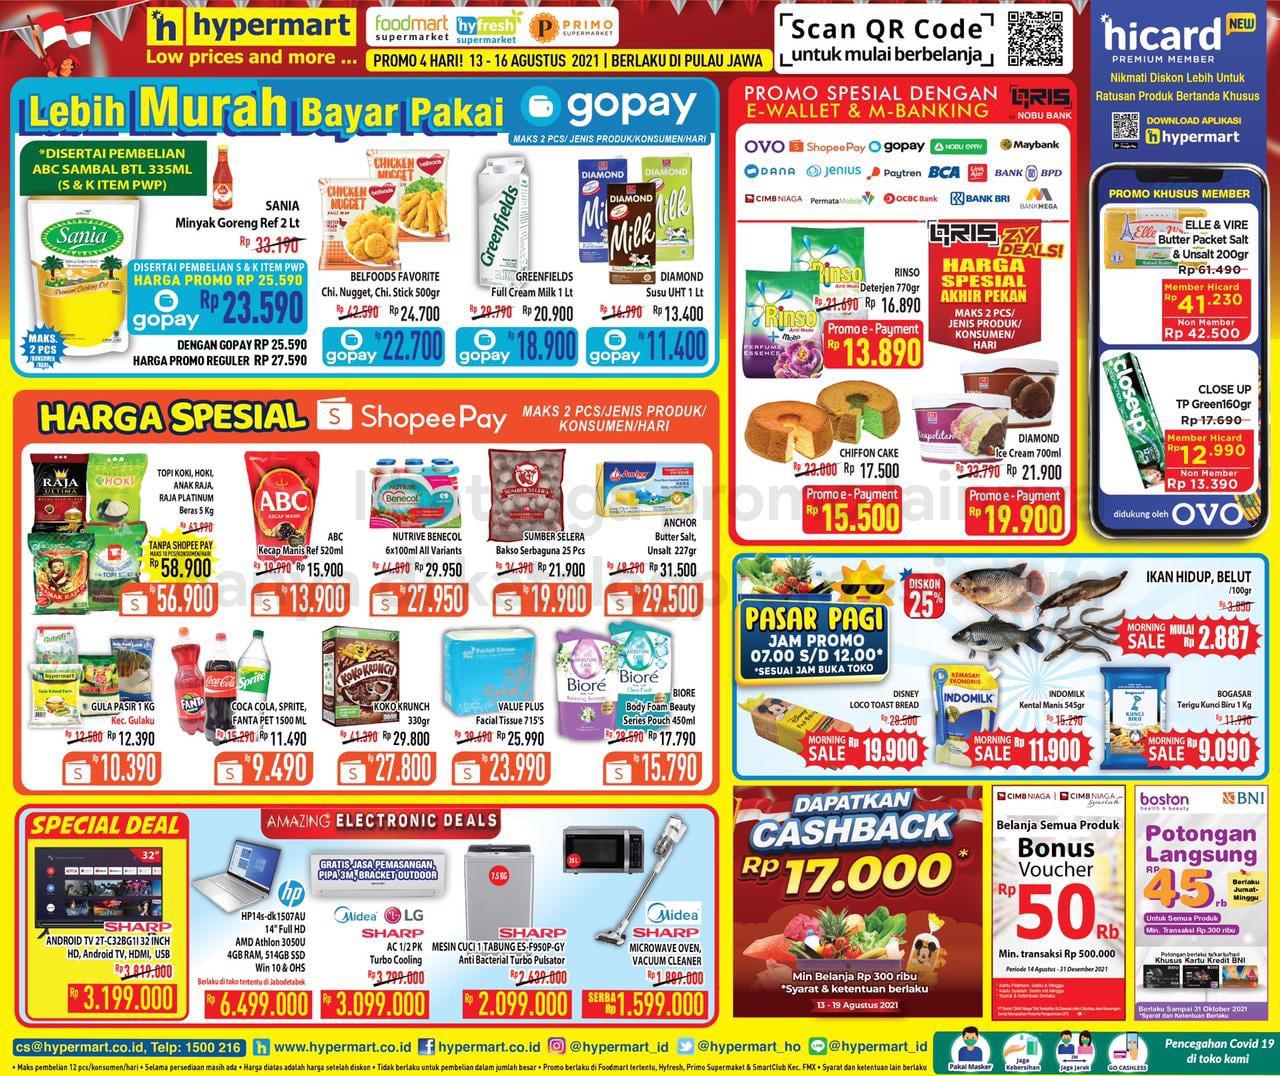 Promo Hypermart JSM Katalog Weekend periode 13-16 Agustus 2021